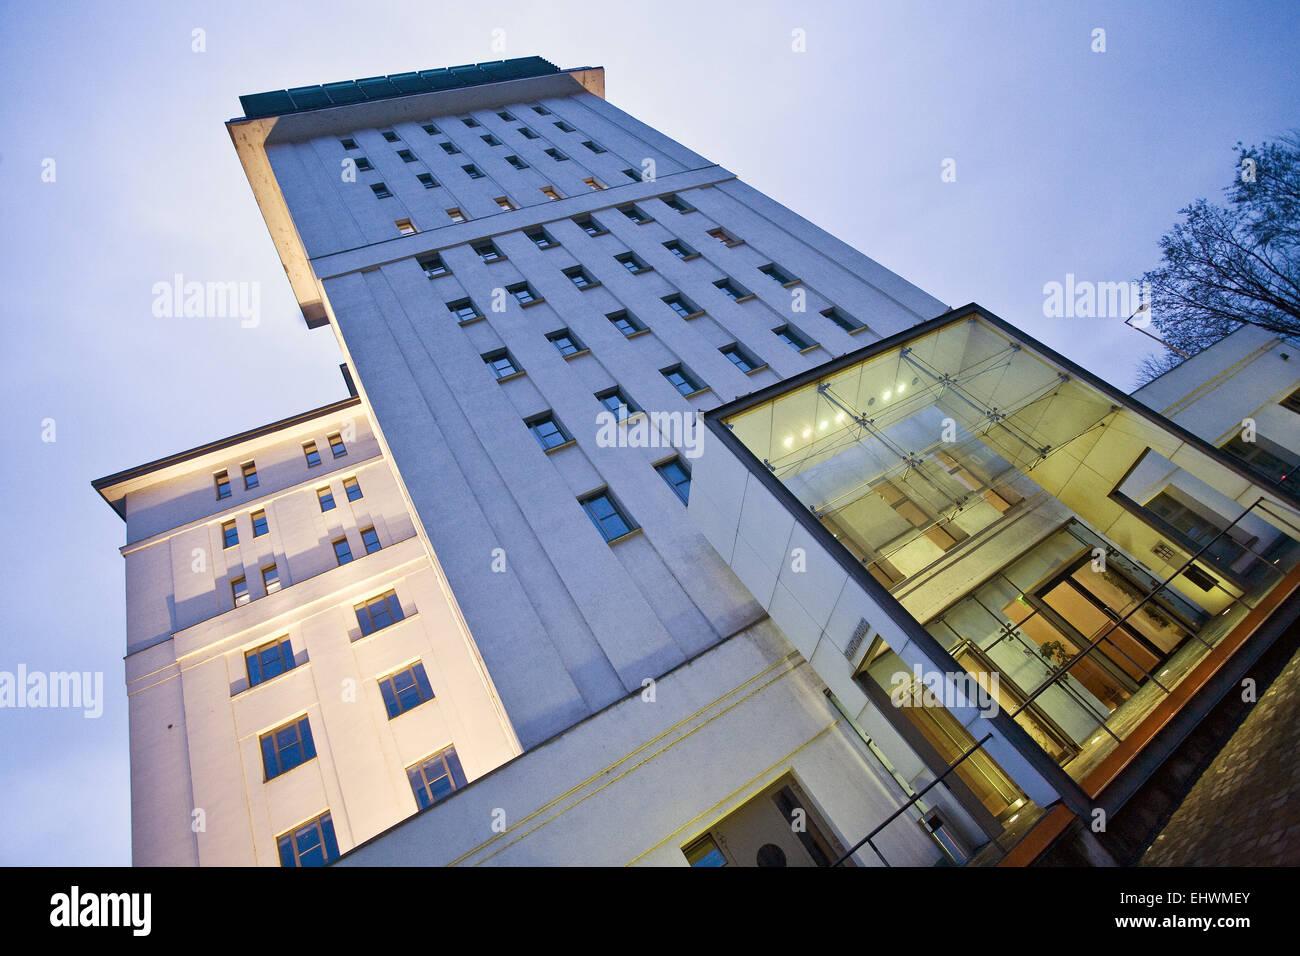 Kontor House, Duisburg Inner Habour, Germany. - Stock Image